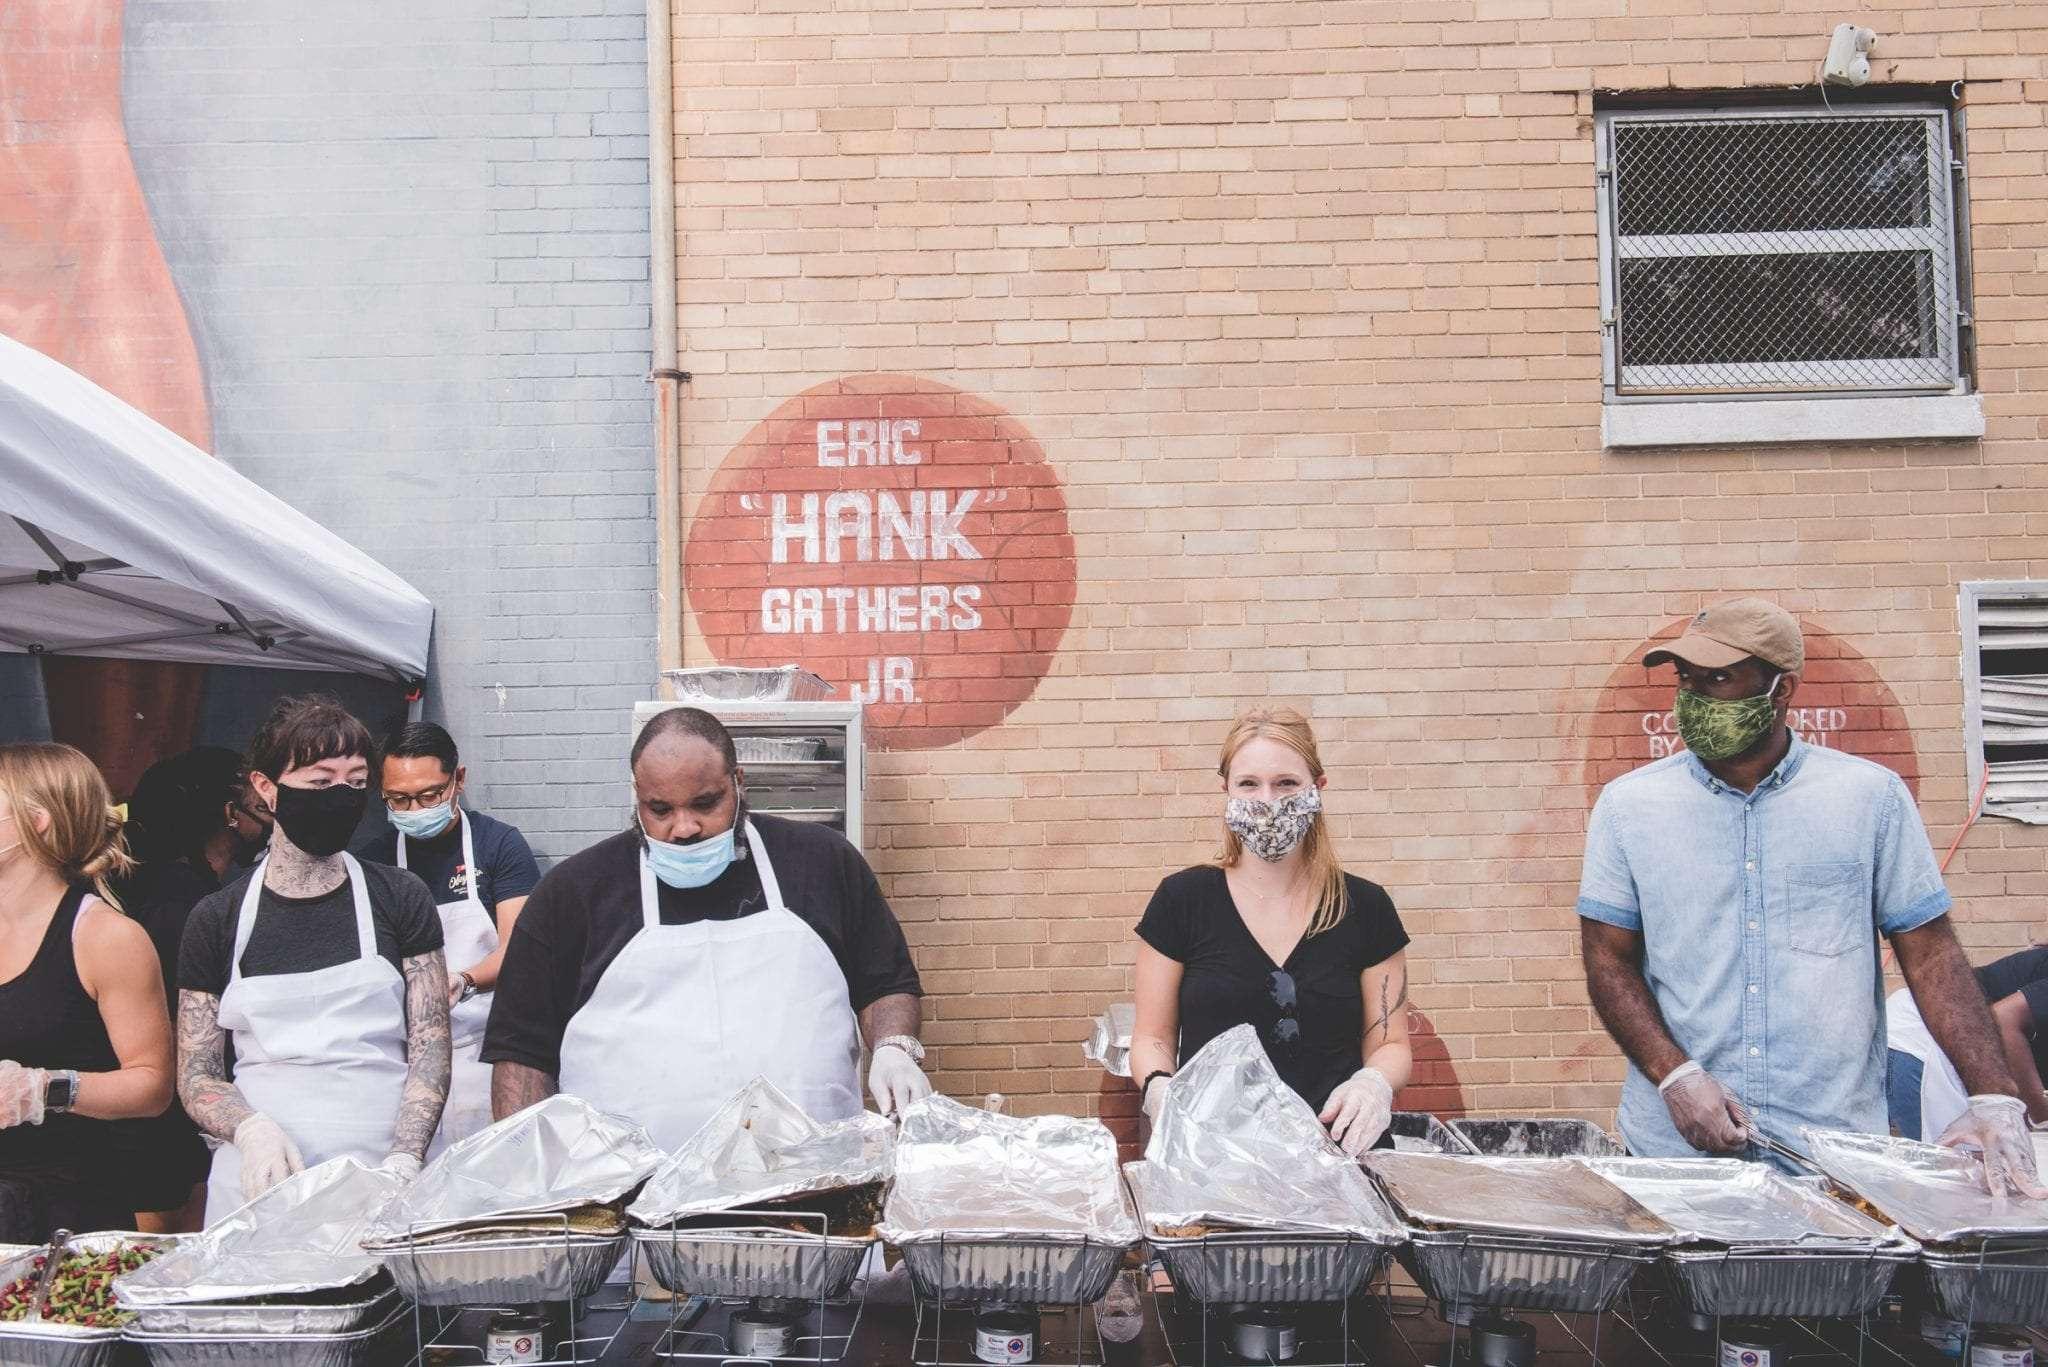 Eric Hank Gathers jr building philadelphia free food